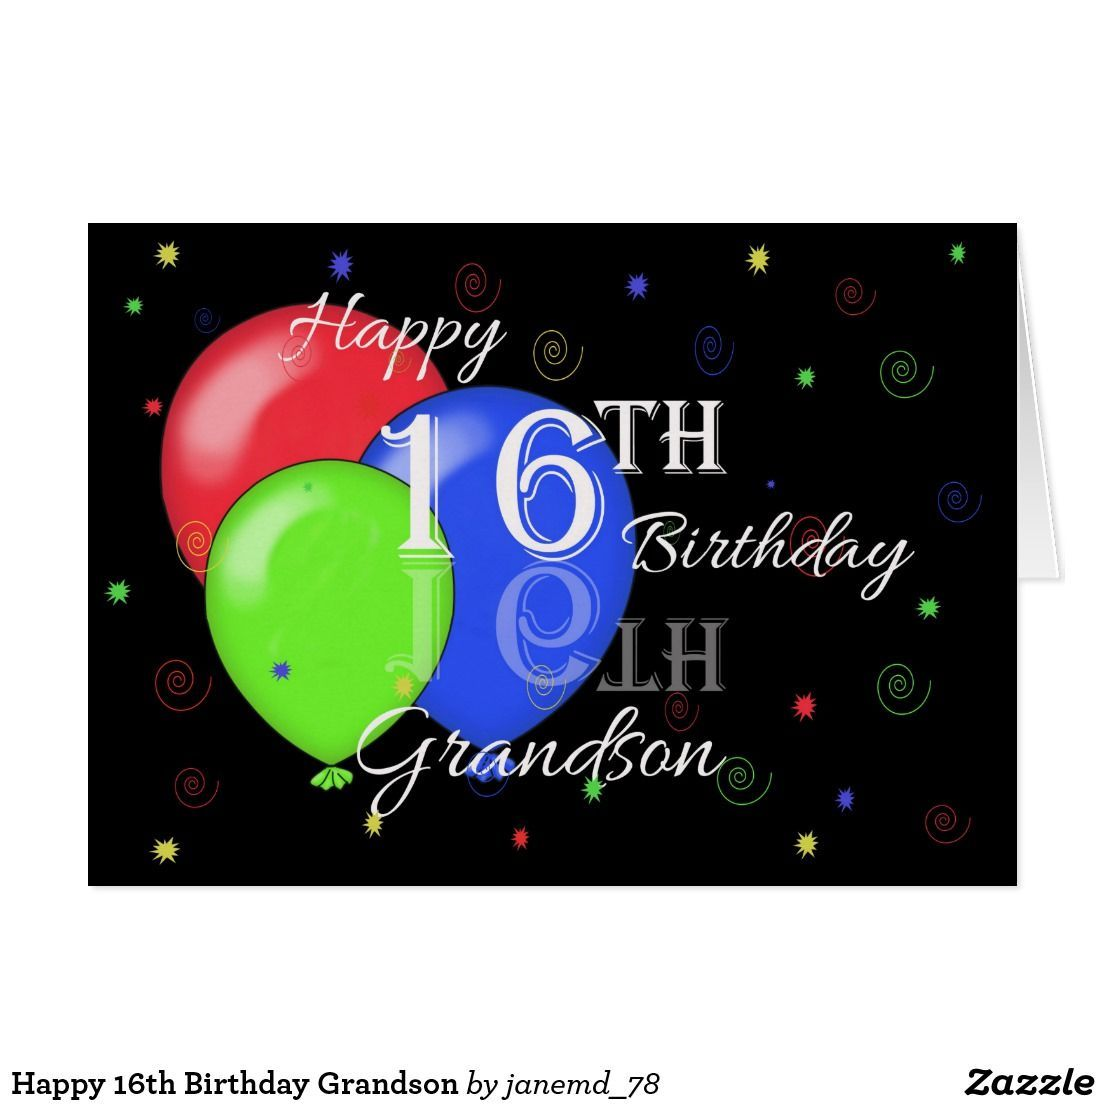 Happy 16th Birthday Grandson Card Zazzle Com Happy 16th